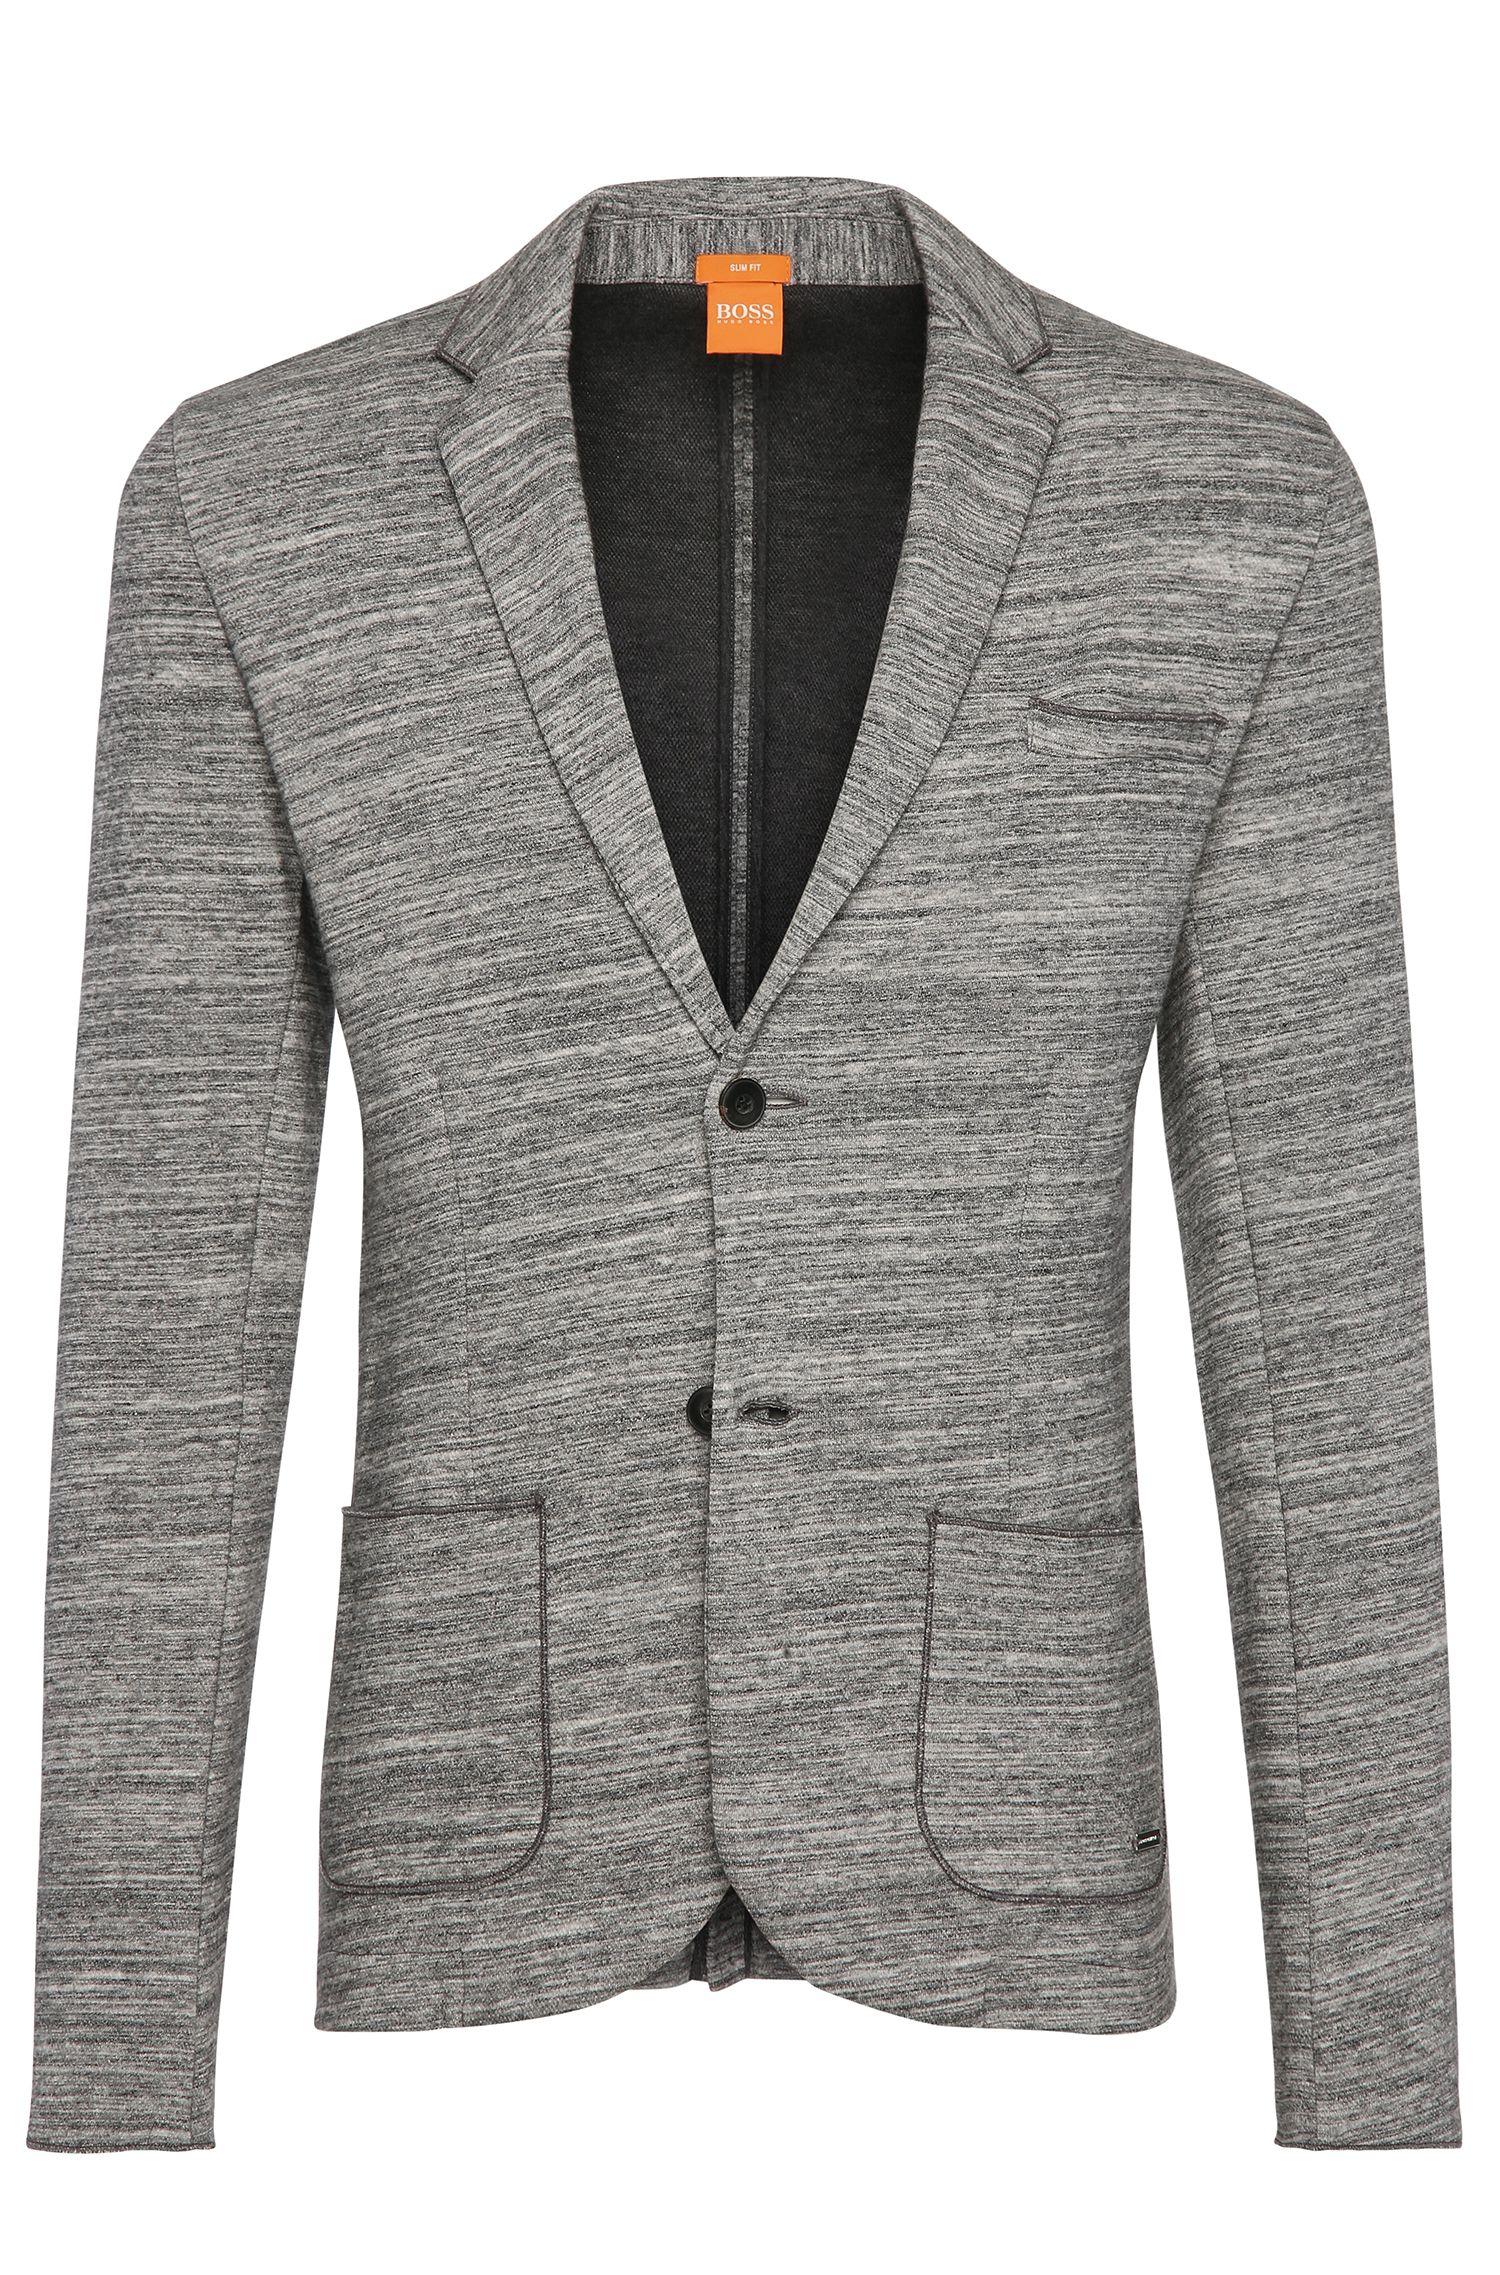 'Wellford' | Slim Fit, Cotton Pique Sweat Sport Coat